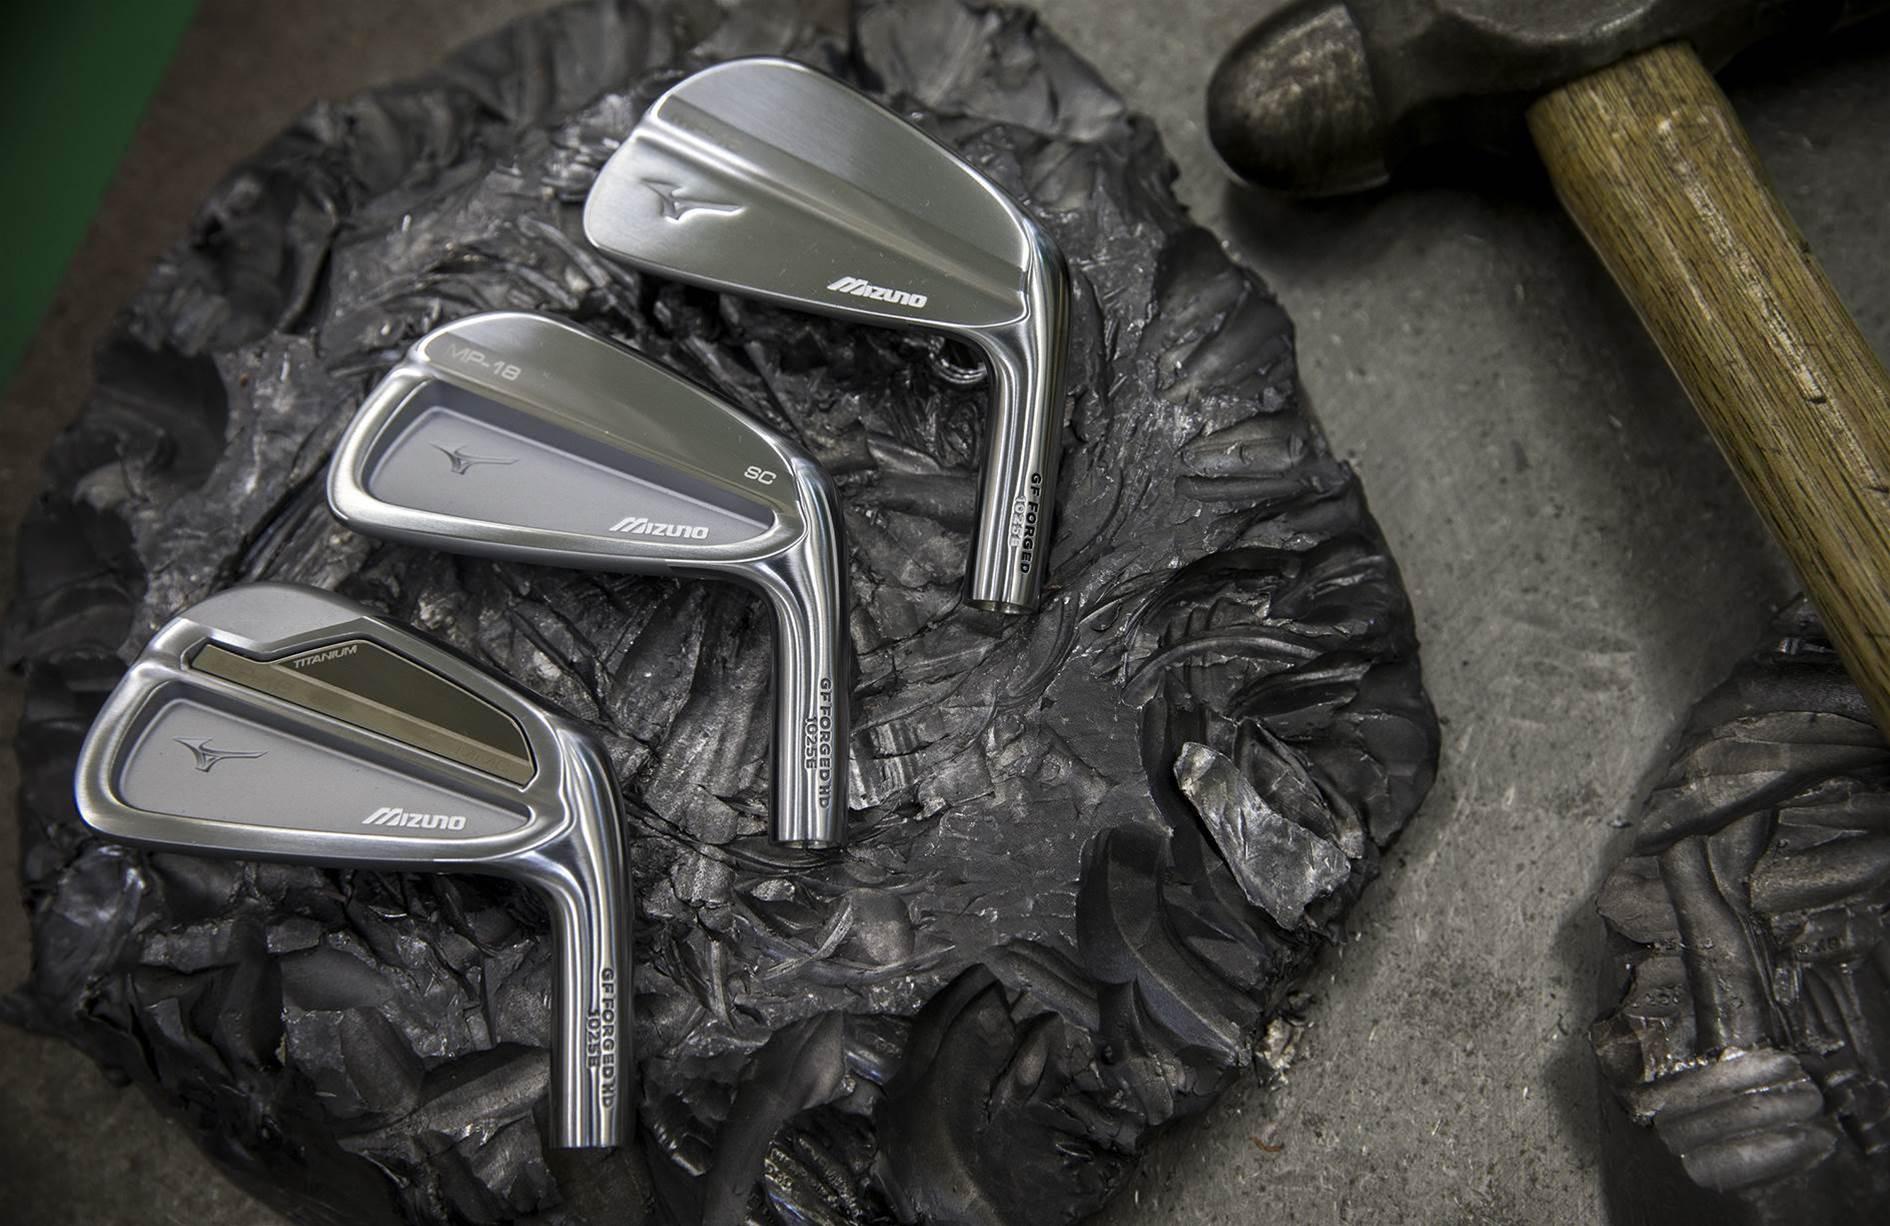 e2ad240a4d0 Mizuno s new MP-18 irons will touch your soul - Golf Australia Magazine